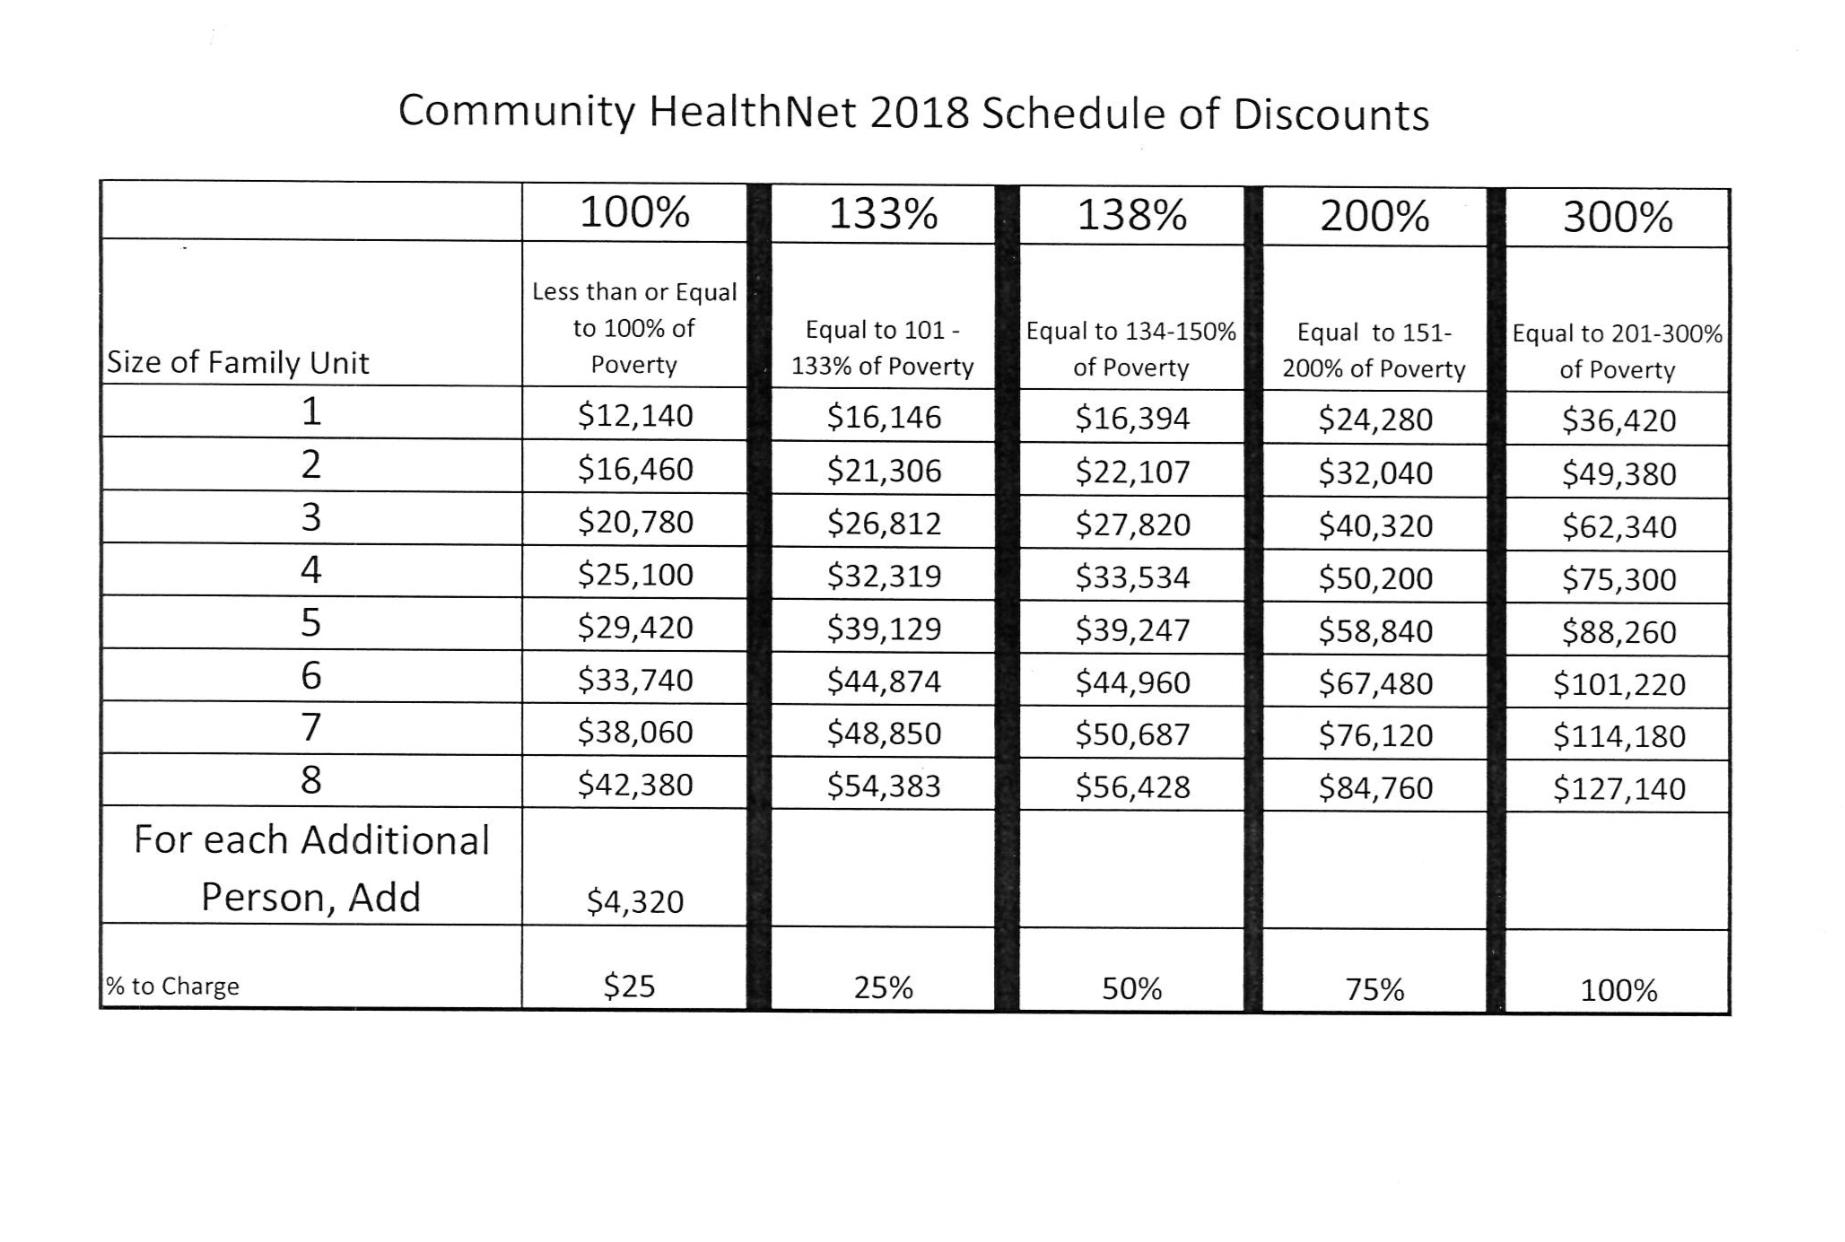 Community HealthNet (CHN) Services